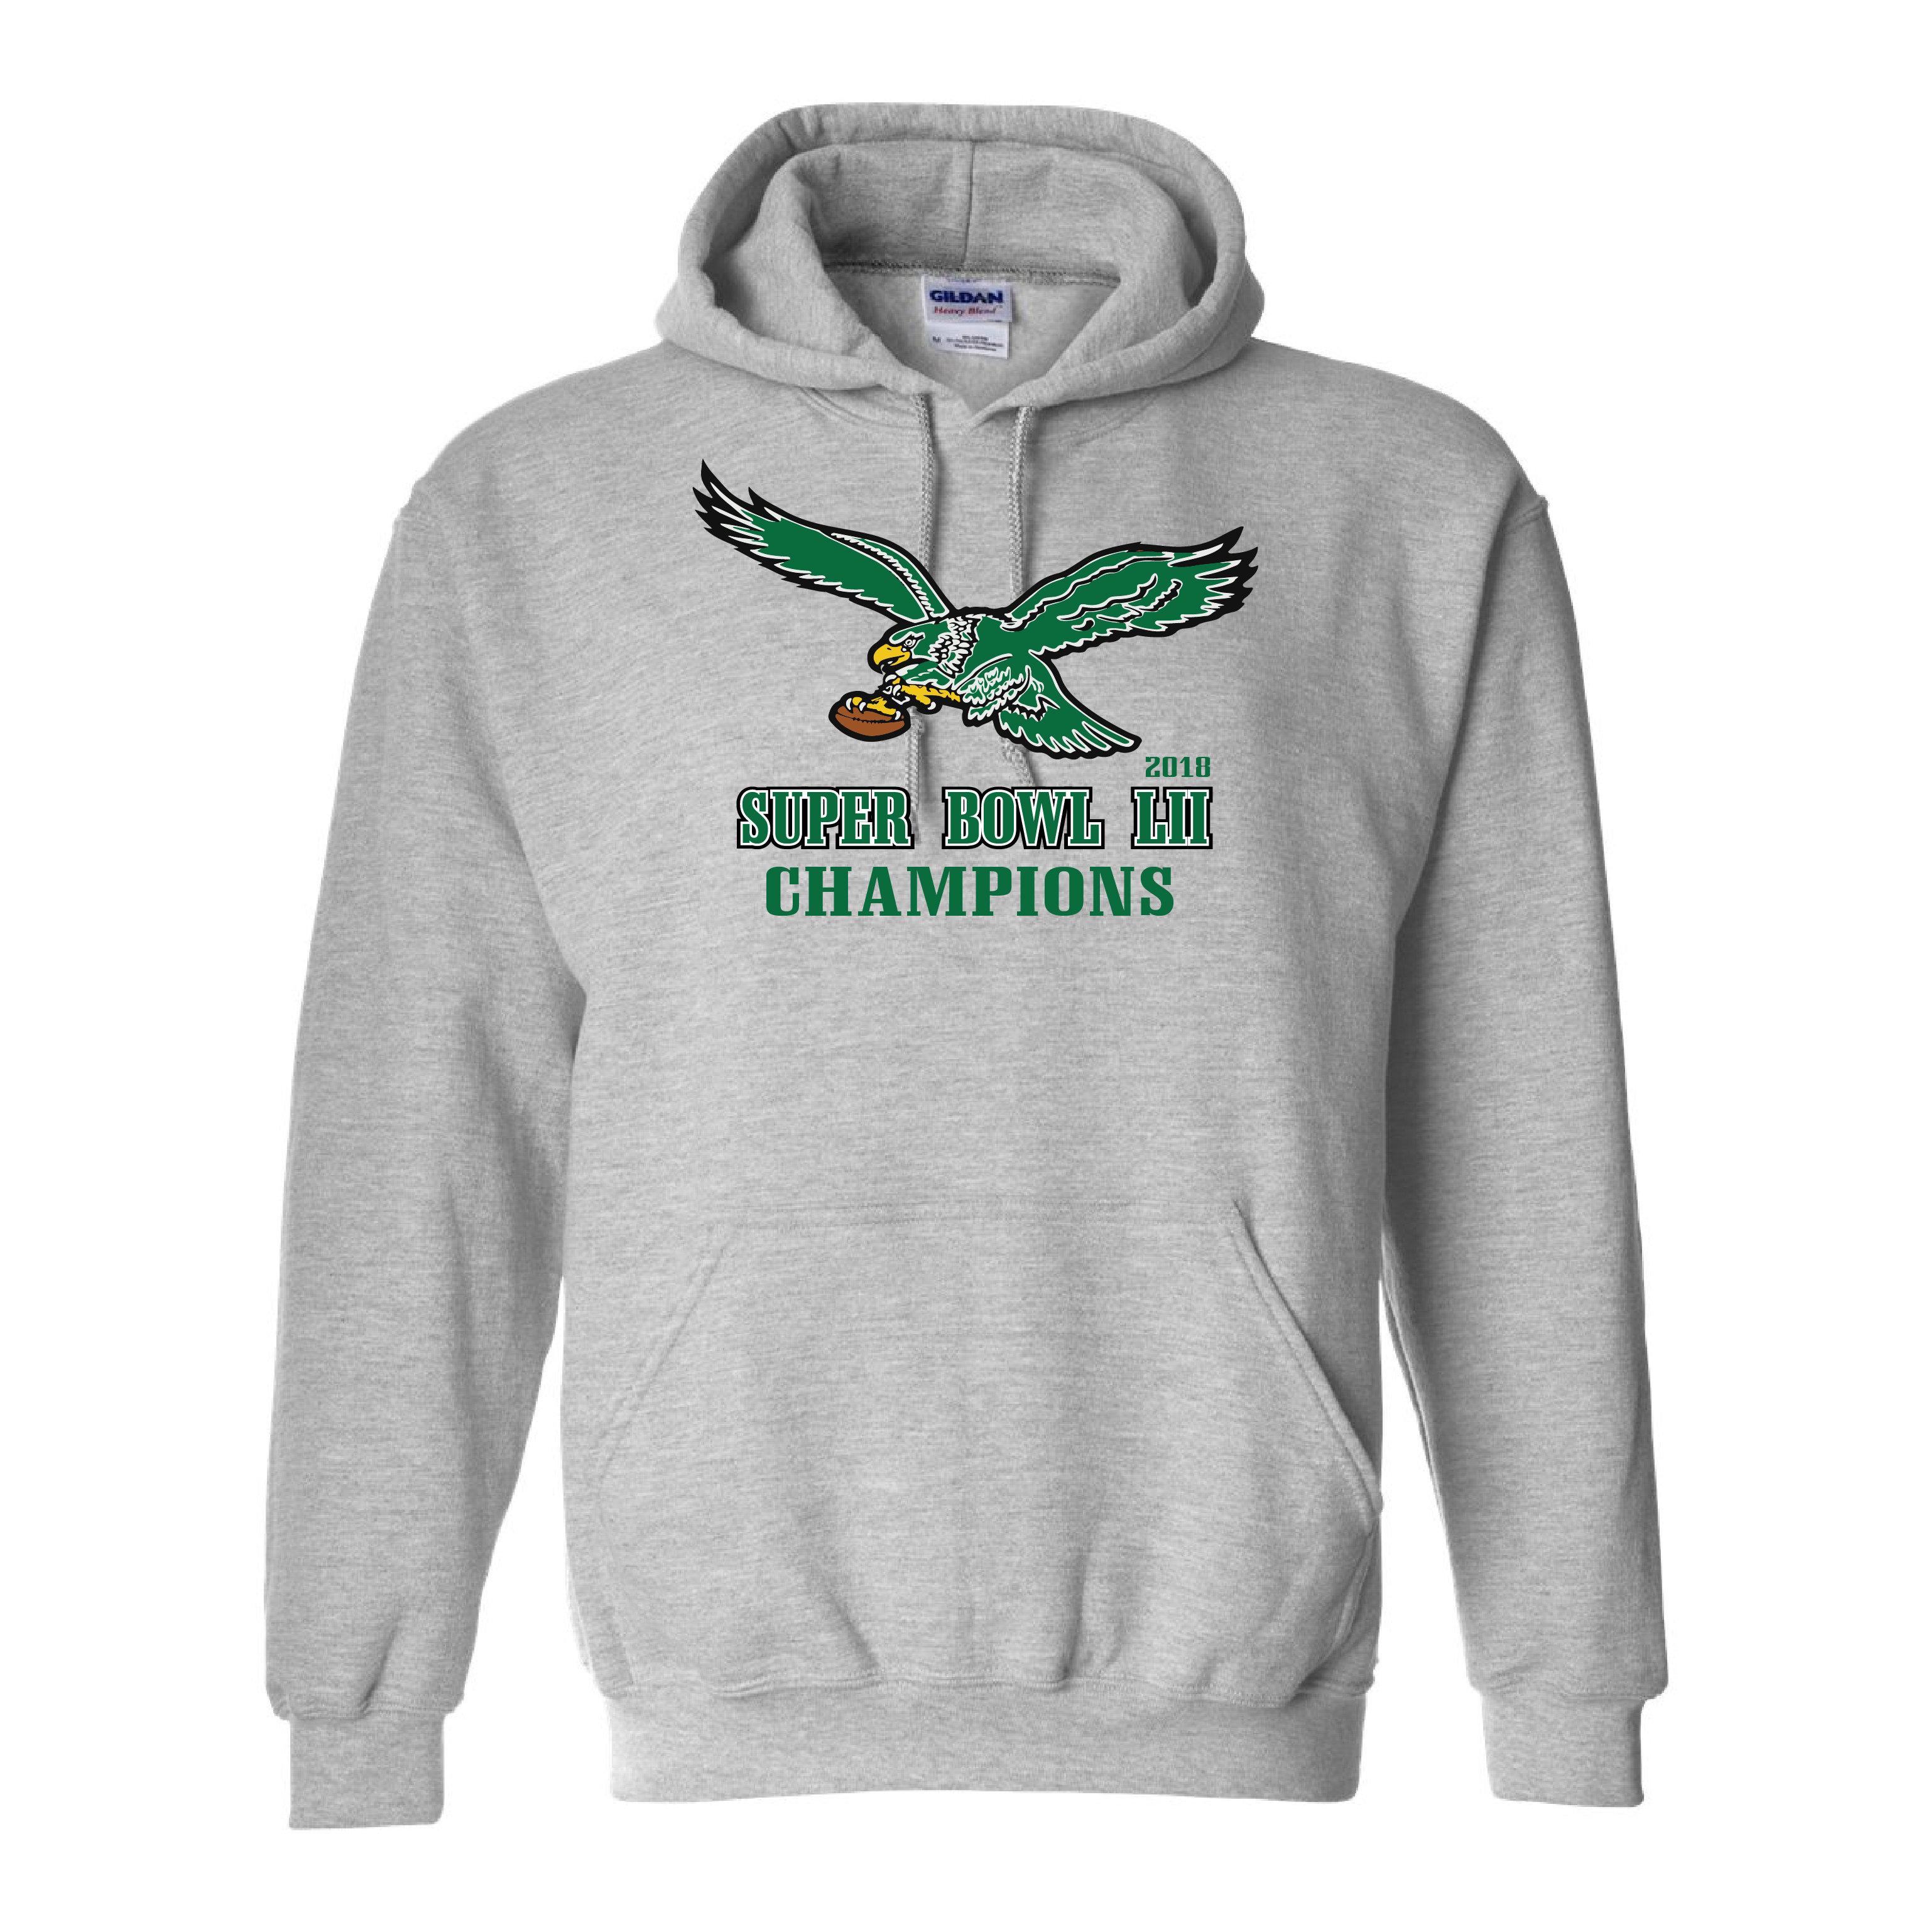 half off 3175b 779e6 Philadelphia Eagles - Super Bowl LII Champions Vintage Style Hooded  Sweatshirt